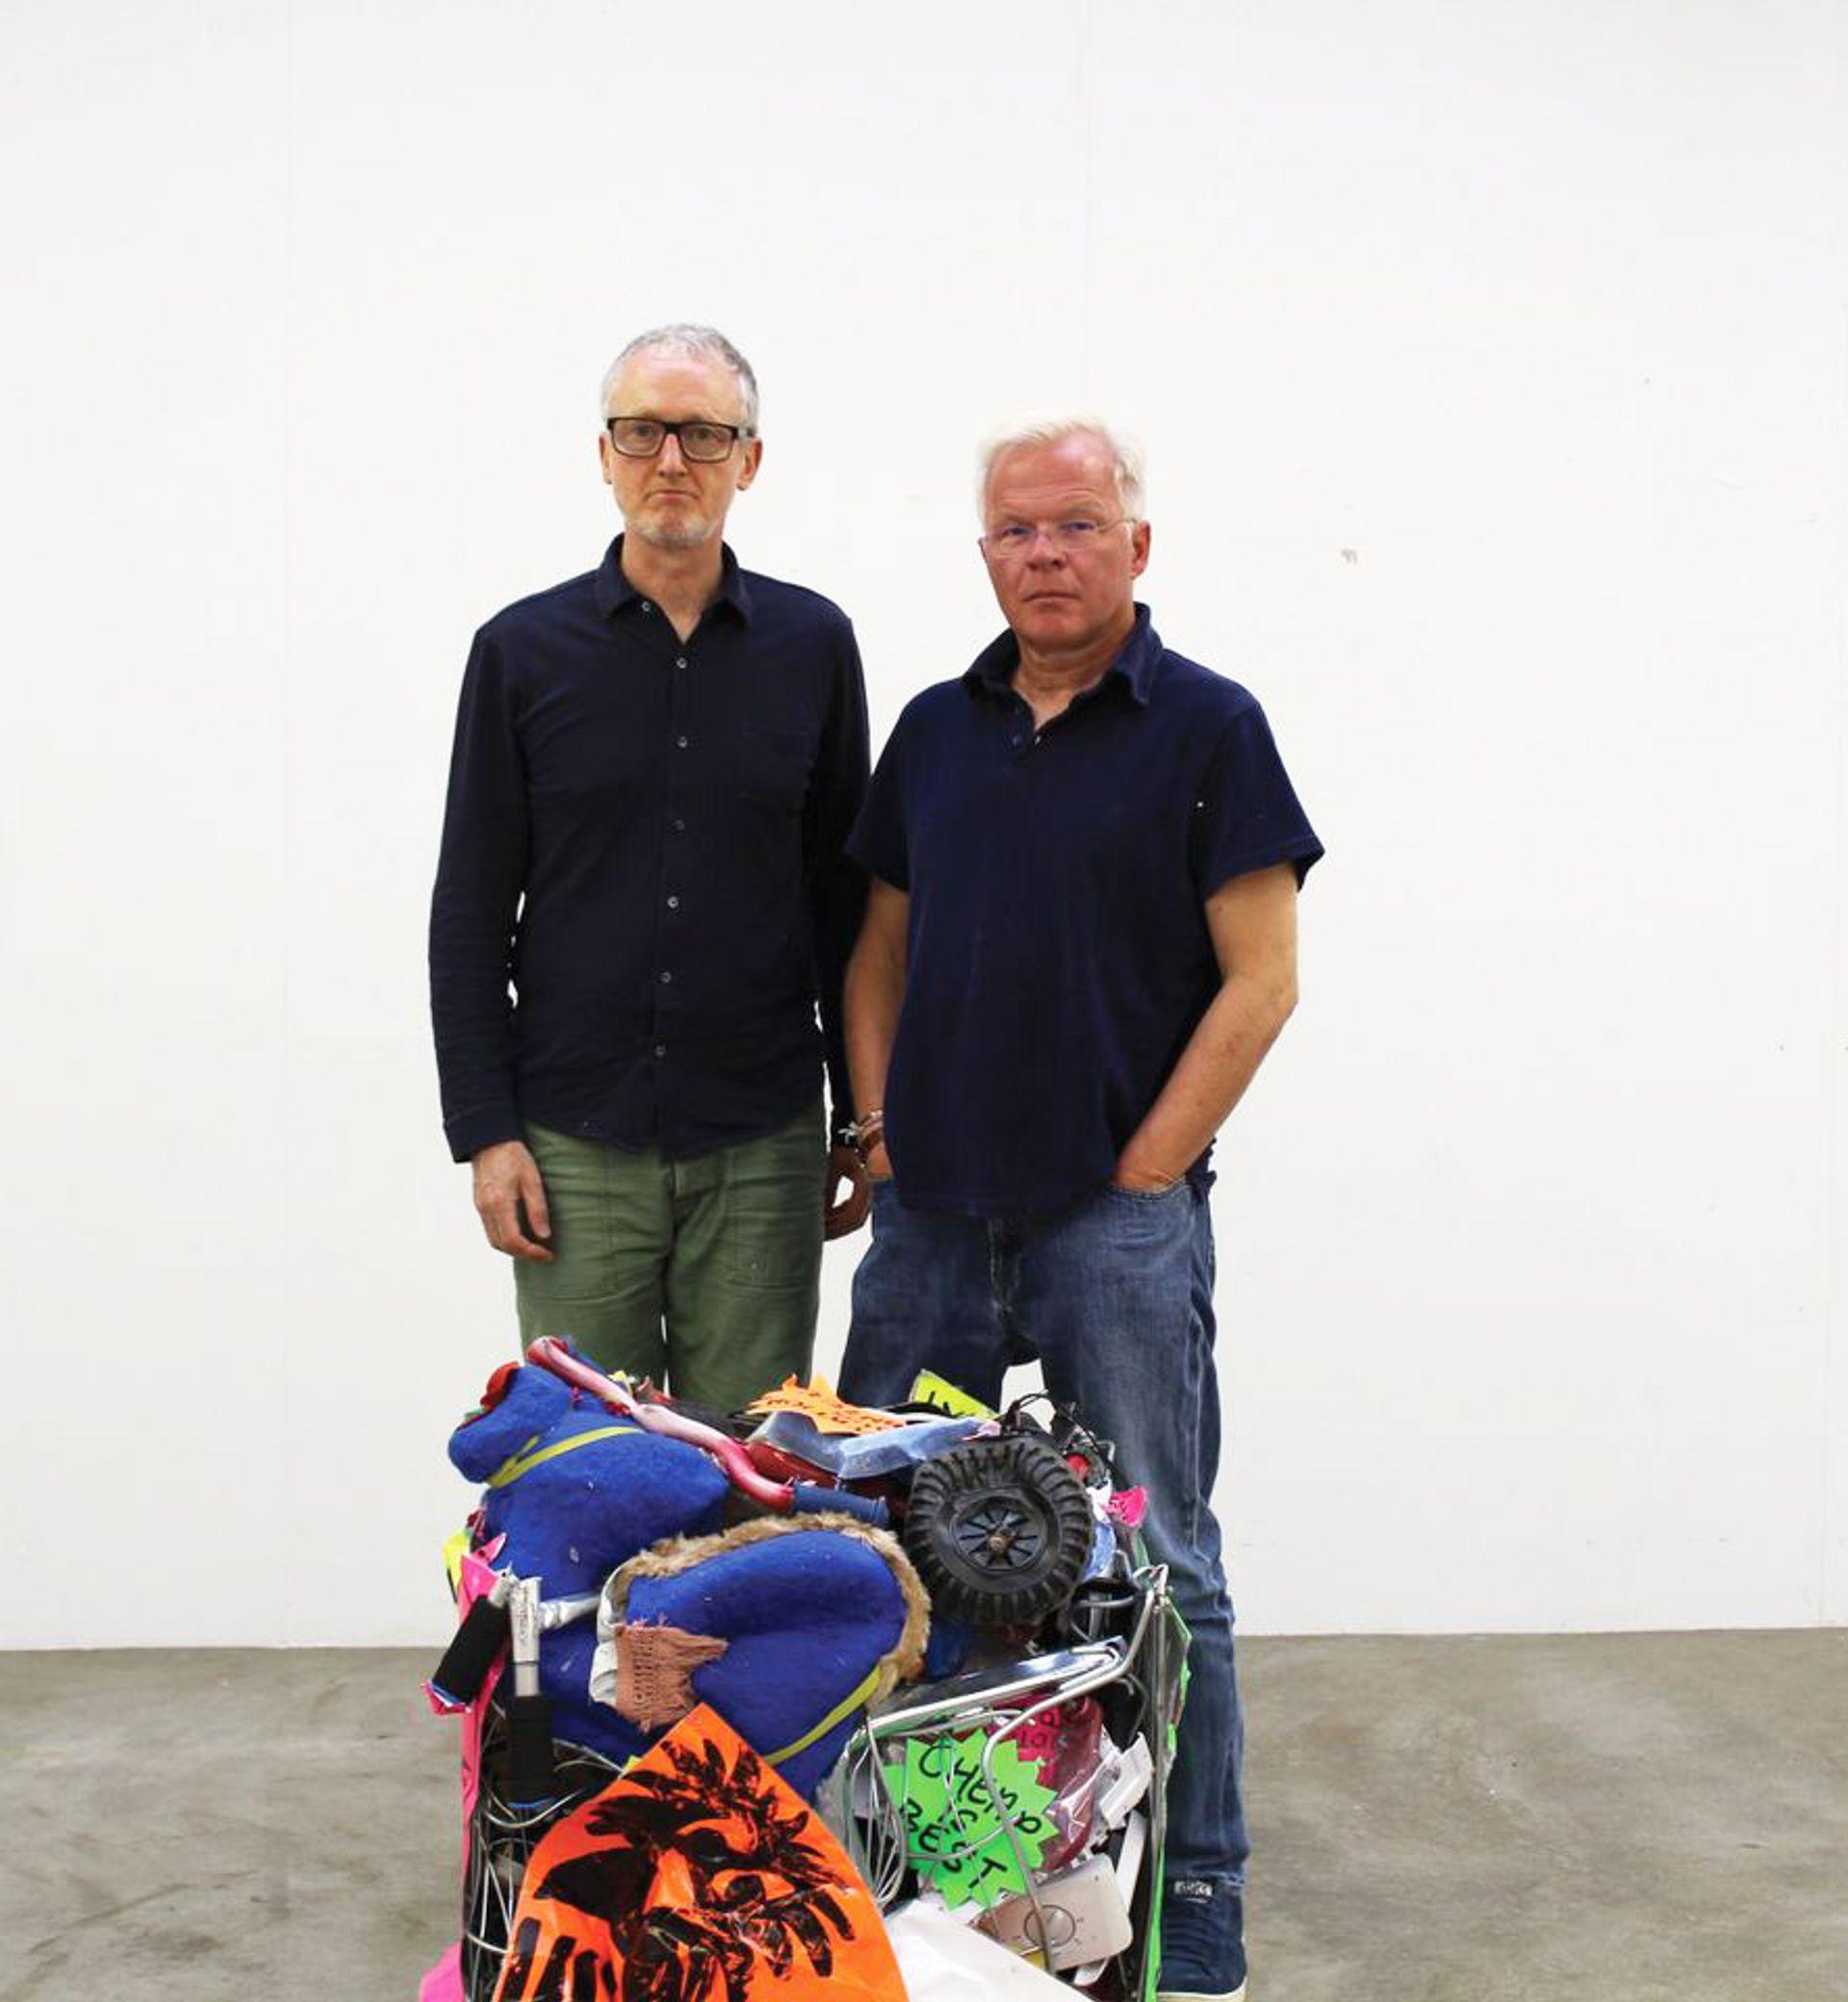 Michael Landy (left) was signed by Karsten Schubert 30 years ago © Karsten Schubert gallery